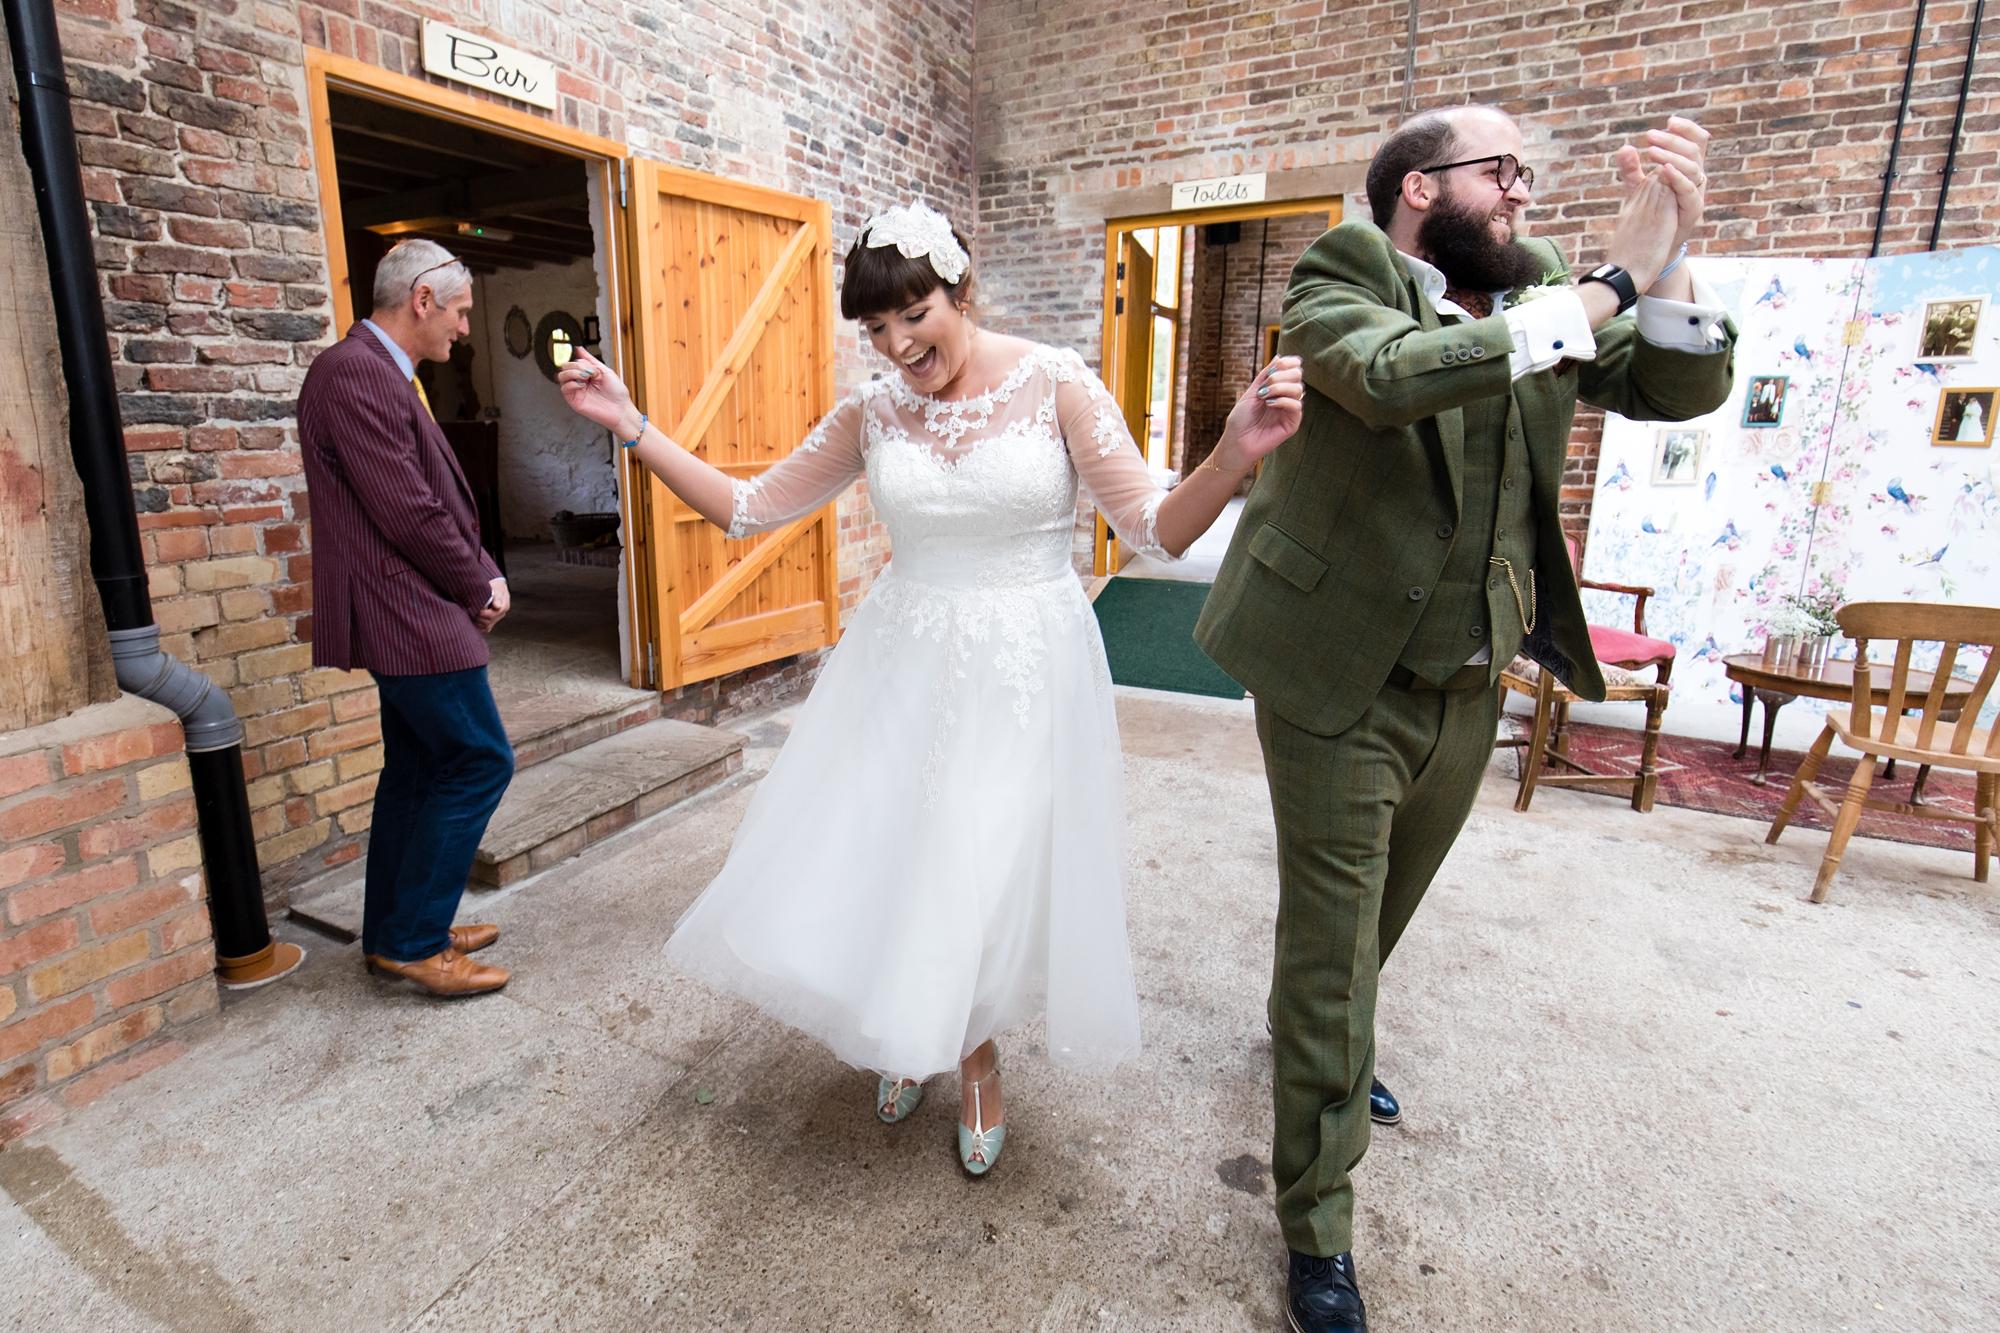 York Wedding Photography at Barmbyfield Barns bride & groom entrance